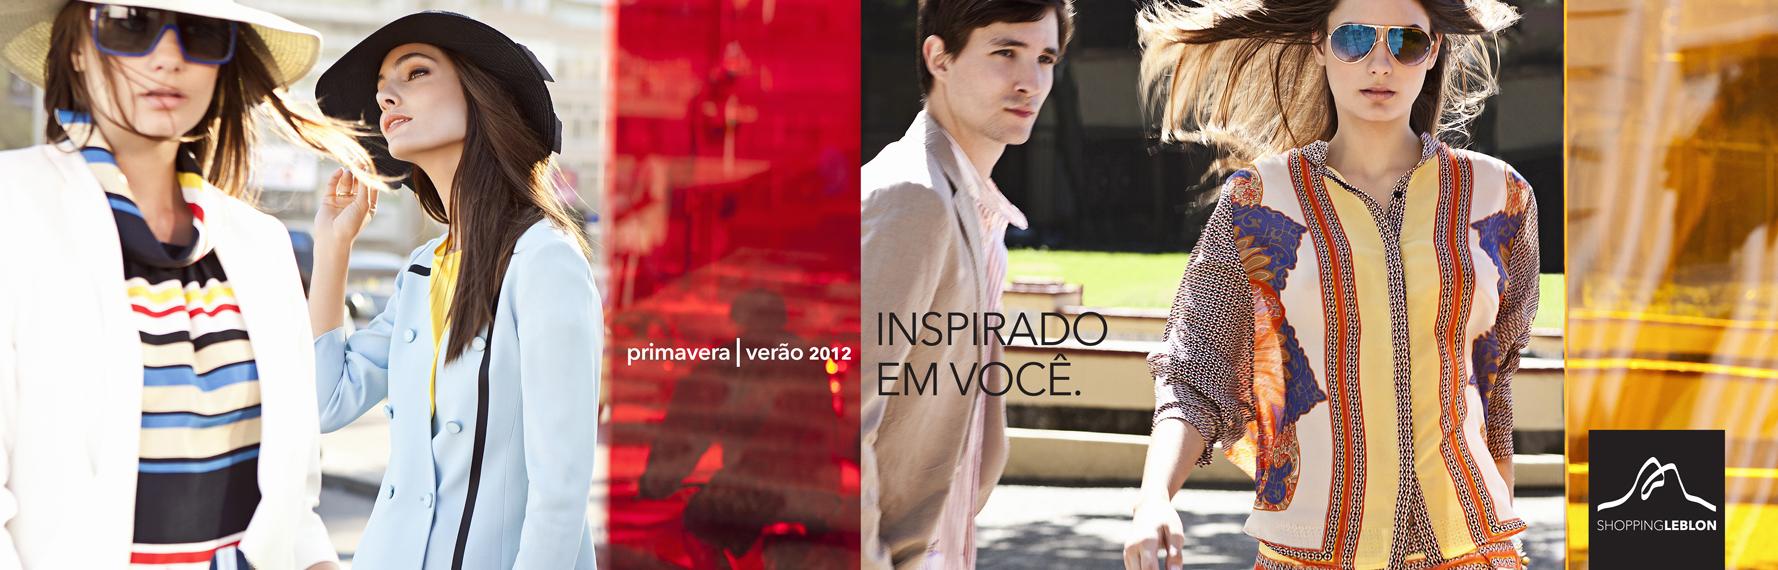 http://www.laet.com.br/site/files/gimgs/84_prim-verbanca-de-jornal577x185cm02final.jpg